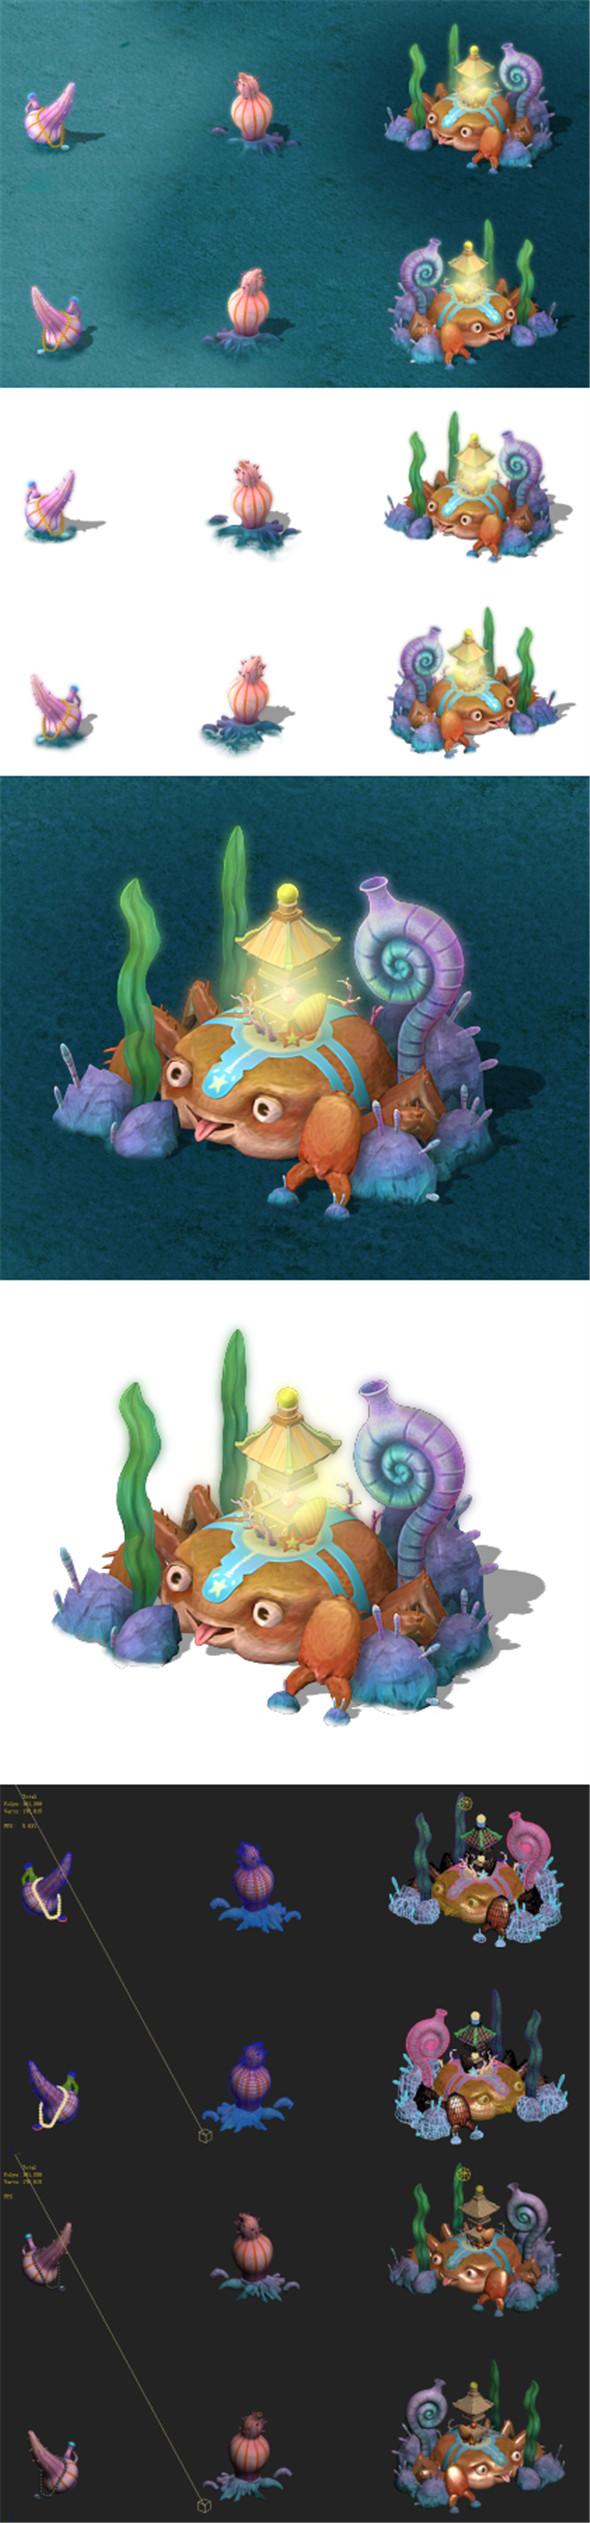 Submarine cartoon world - wild decorations - 3DOcean Item for Sale